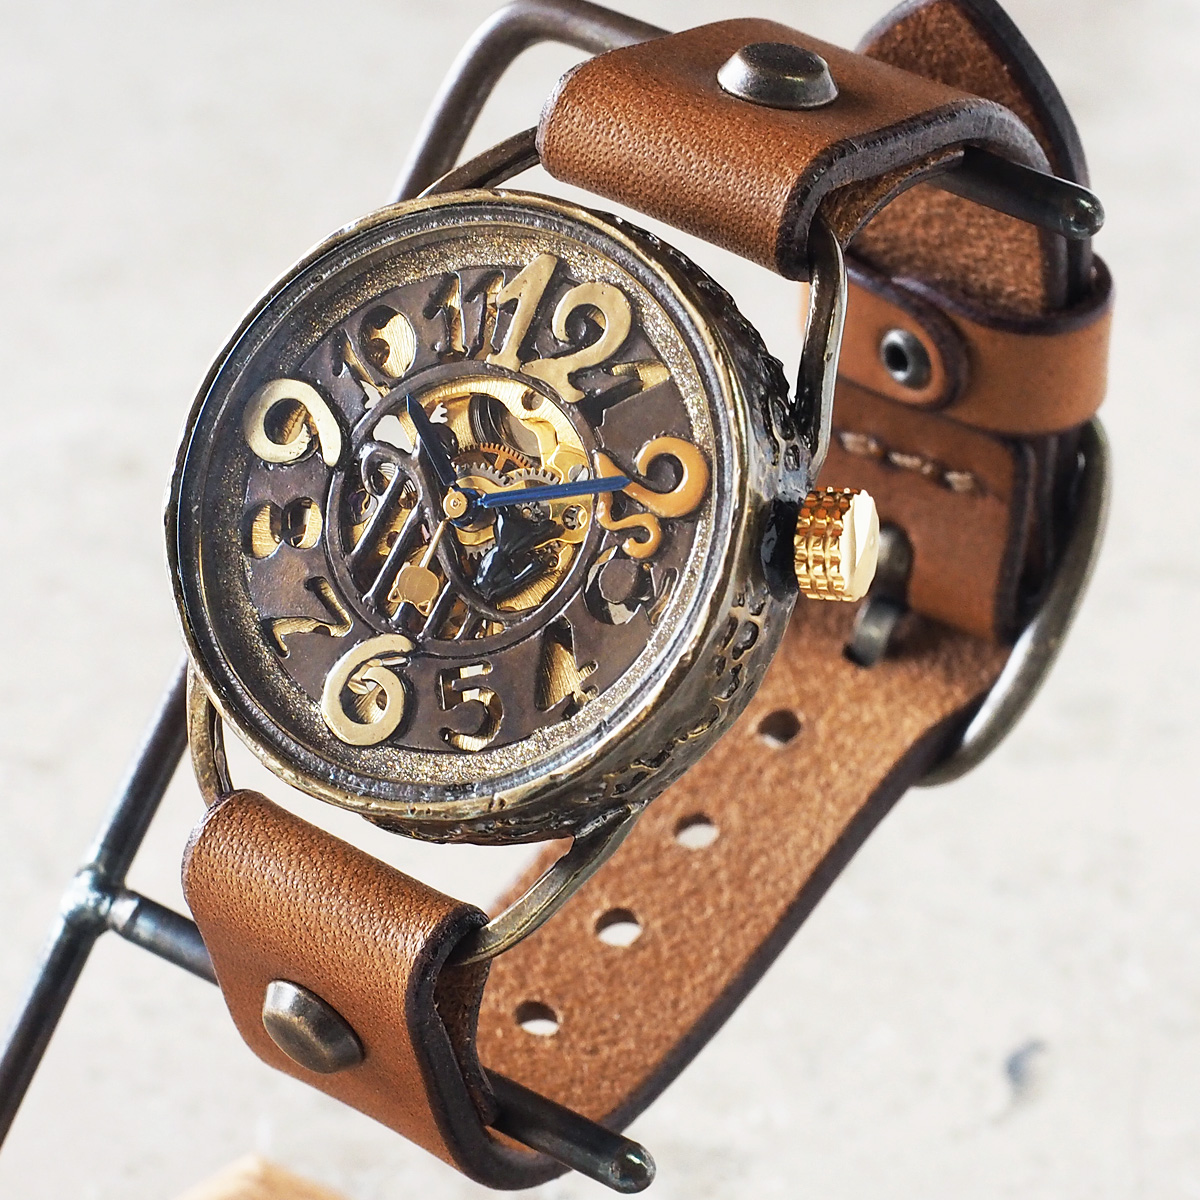 KINO(キノ) 手作り腕時計 手巻き機械式 裏スケルトン メカニャン [MEKANYAN]